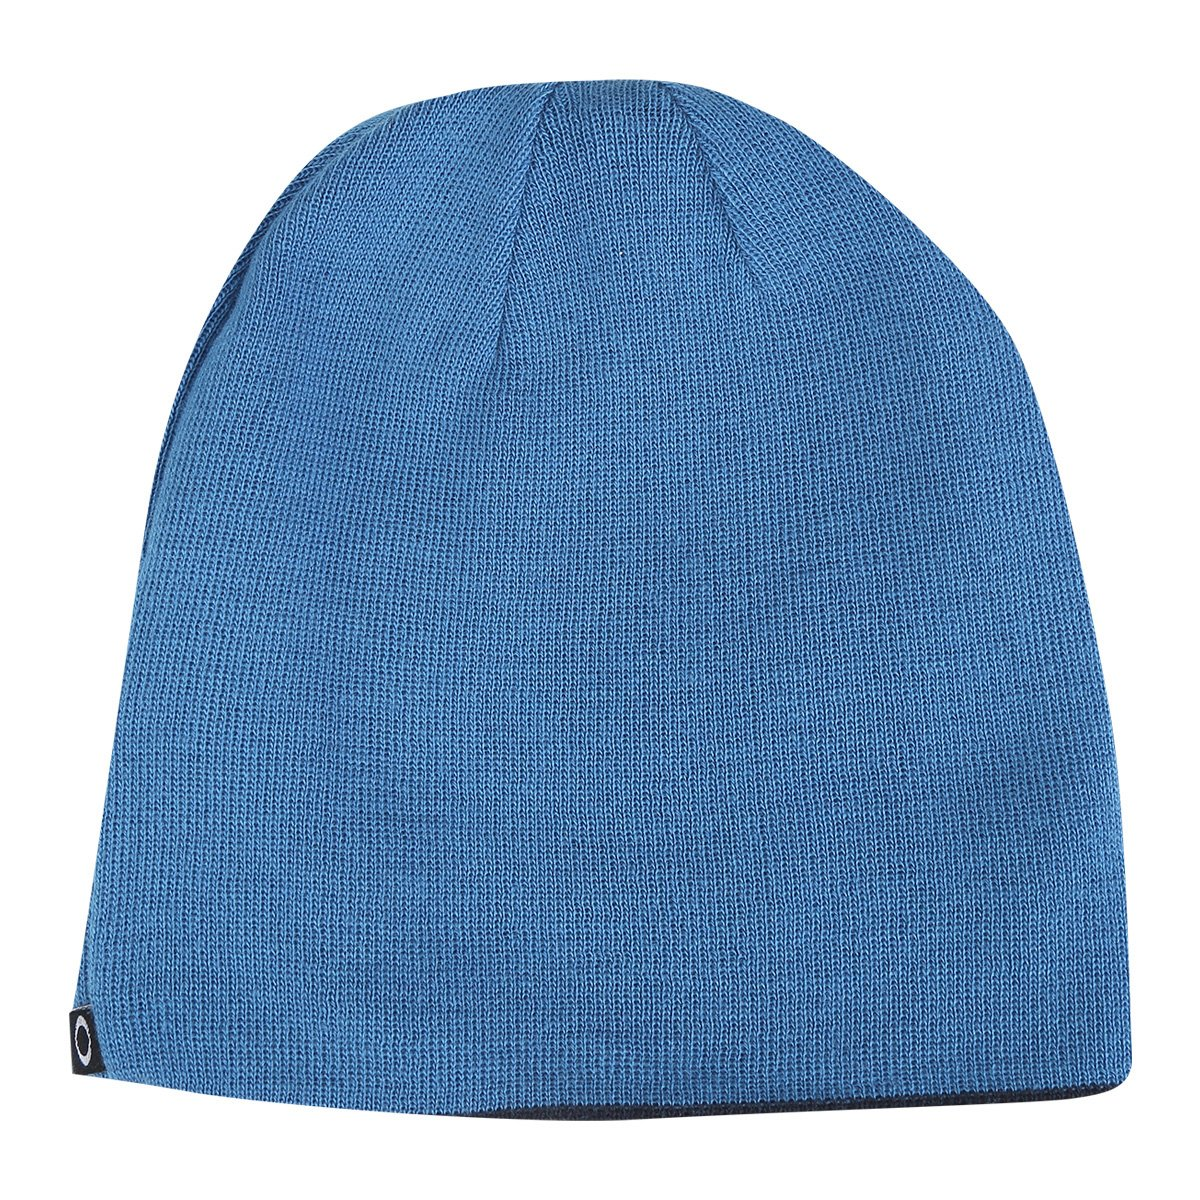 Gorro Oakley Mainline Beanie Dupla Face Masculino - Azul - Compre ... 67566ea83b3